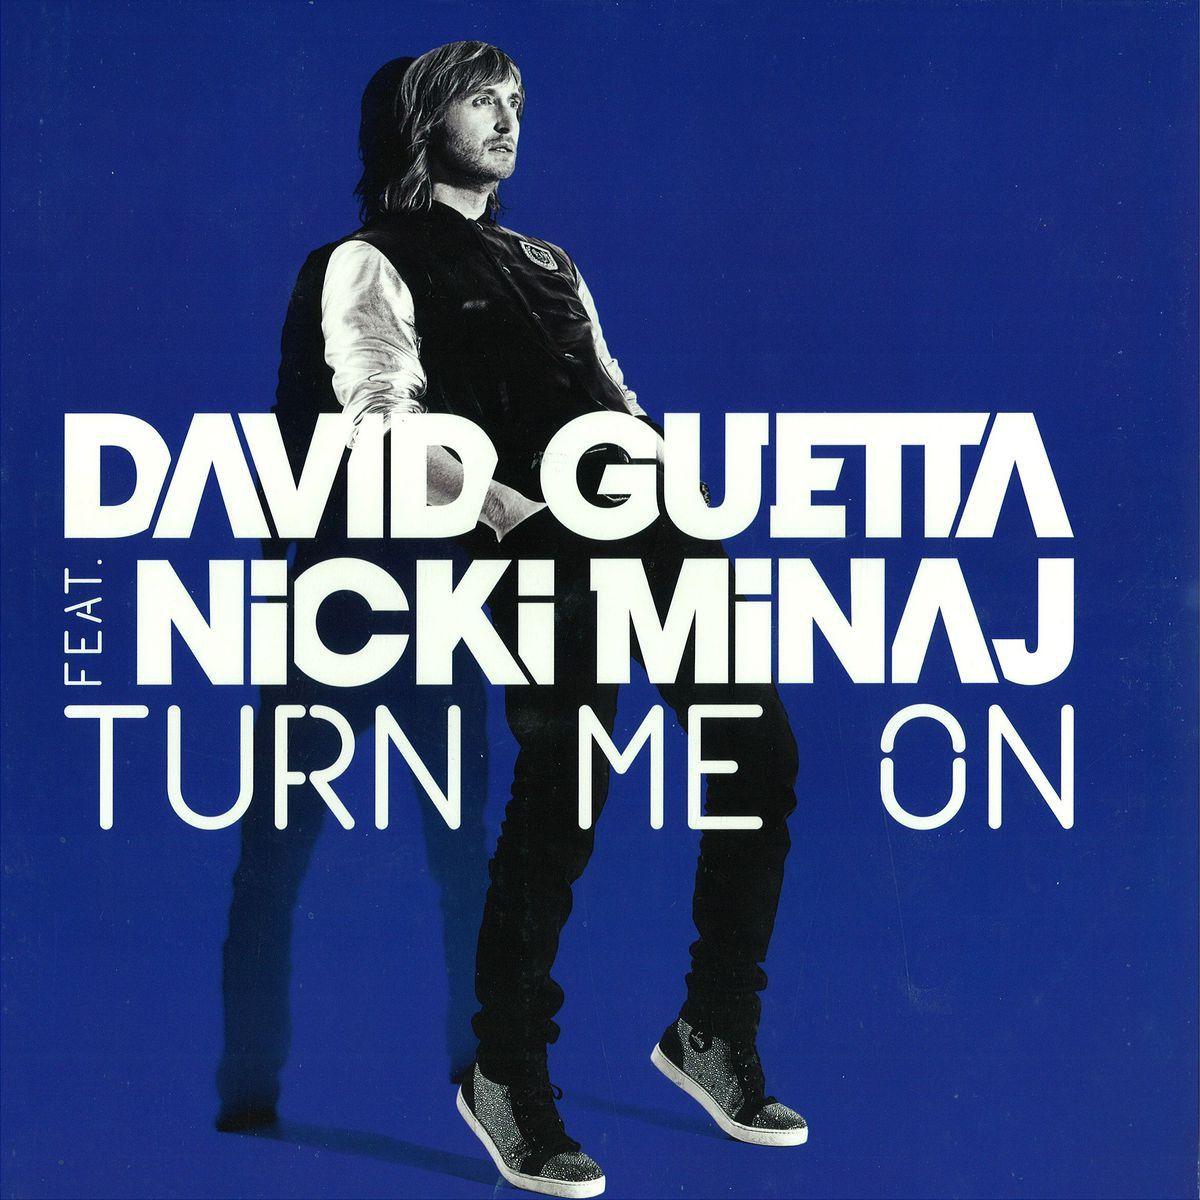 David Guetta Turn Me On David Guetta Album Covers